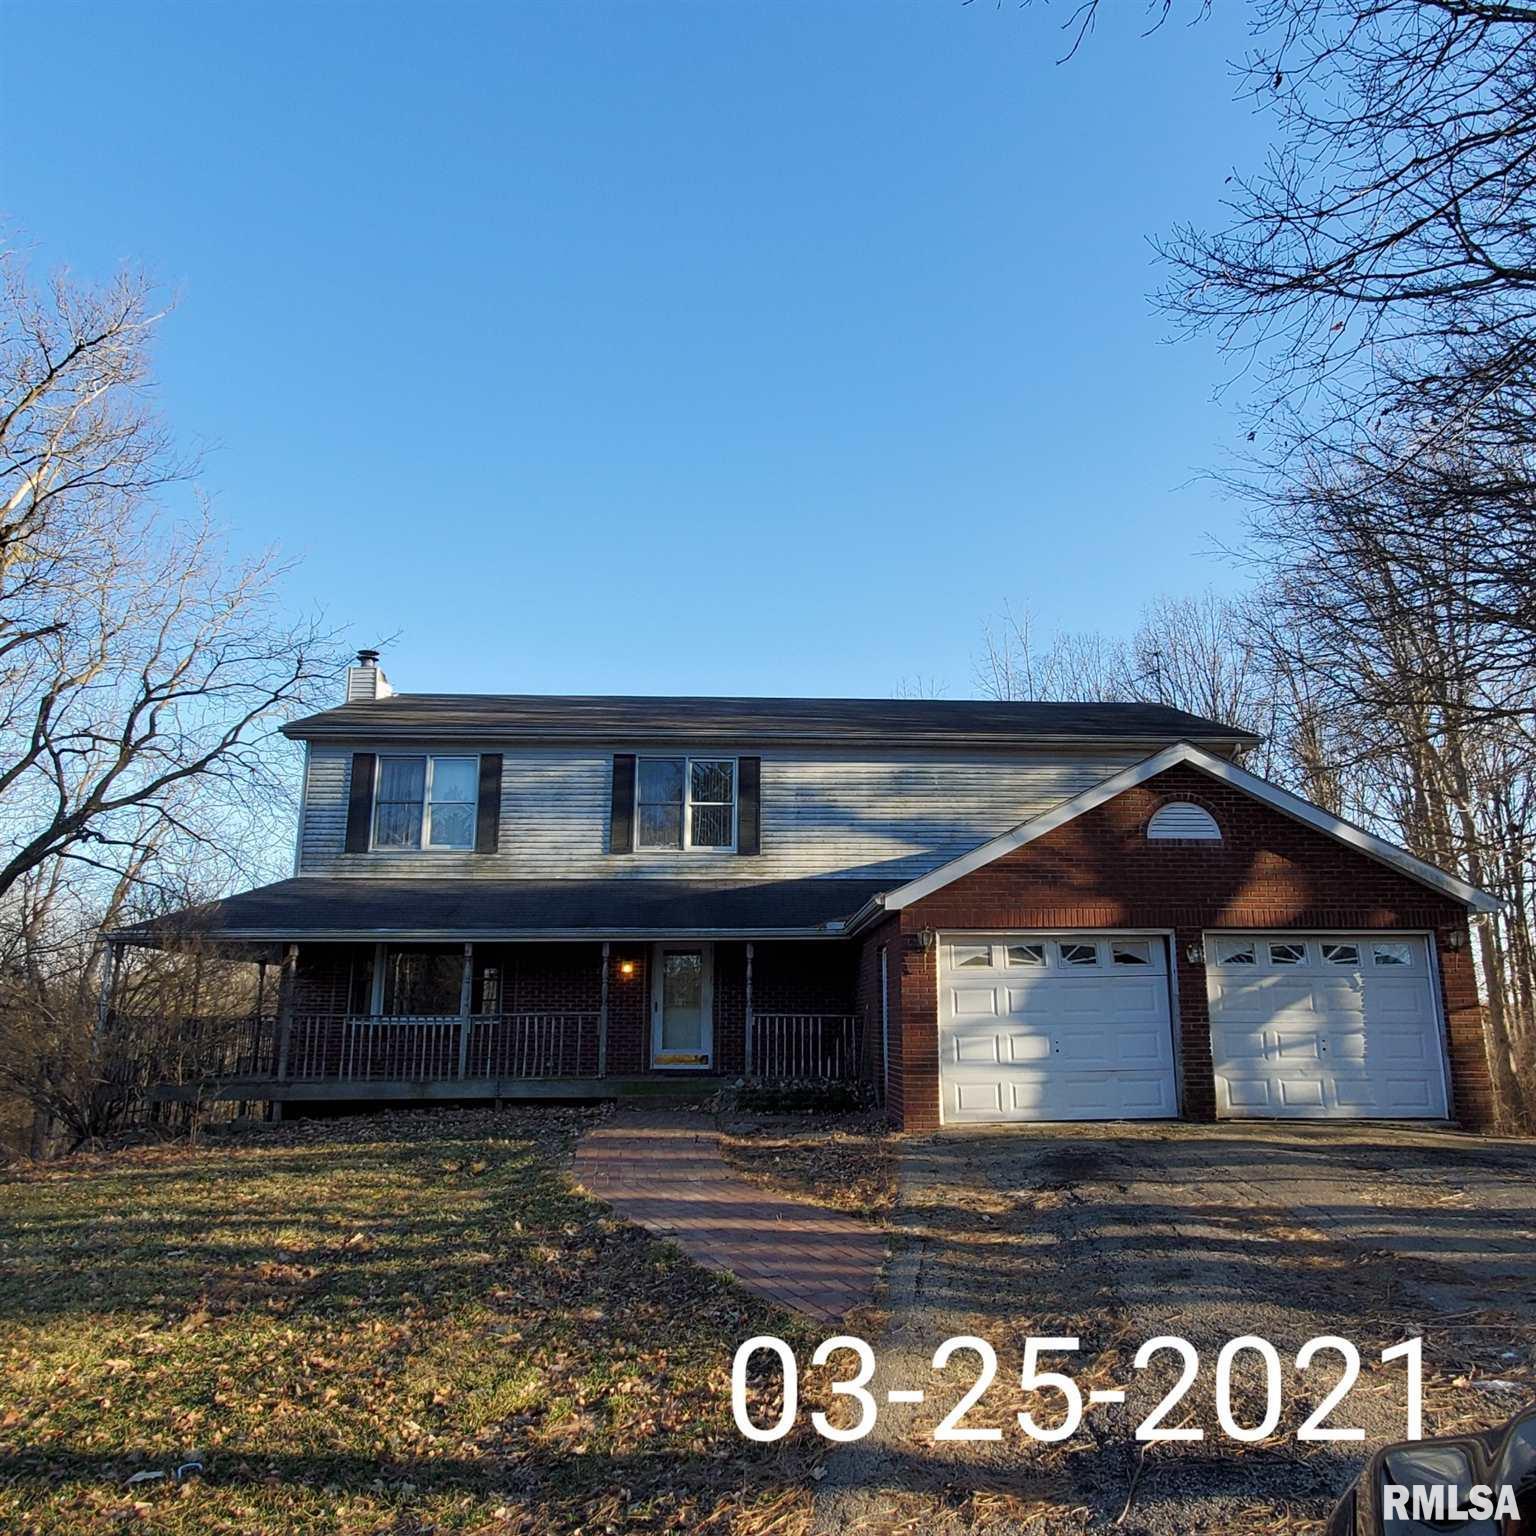 545 SANTA FE Property Photo - Metamora, IL real estate listing